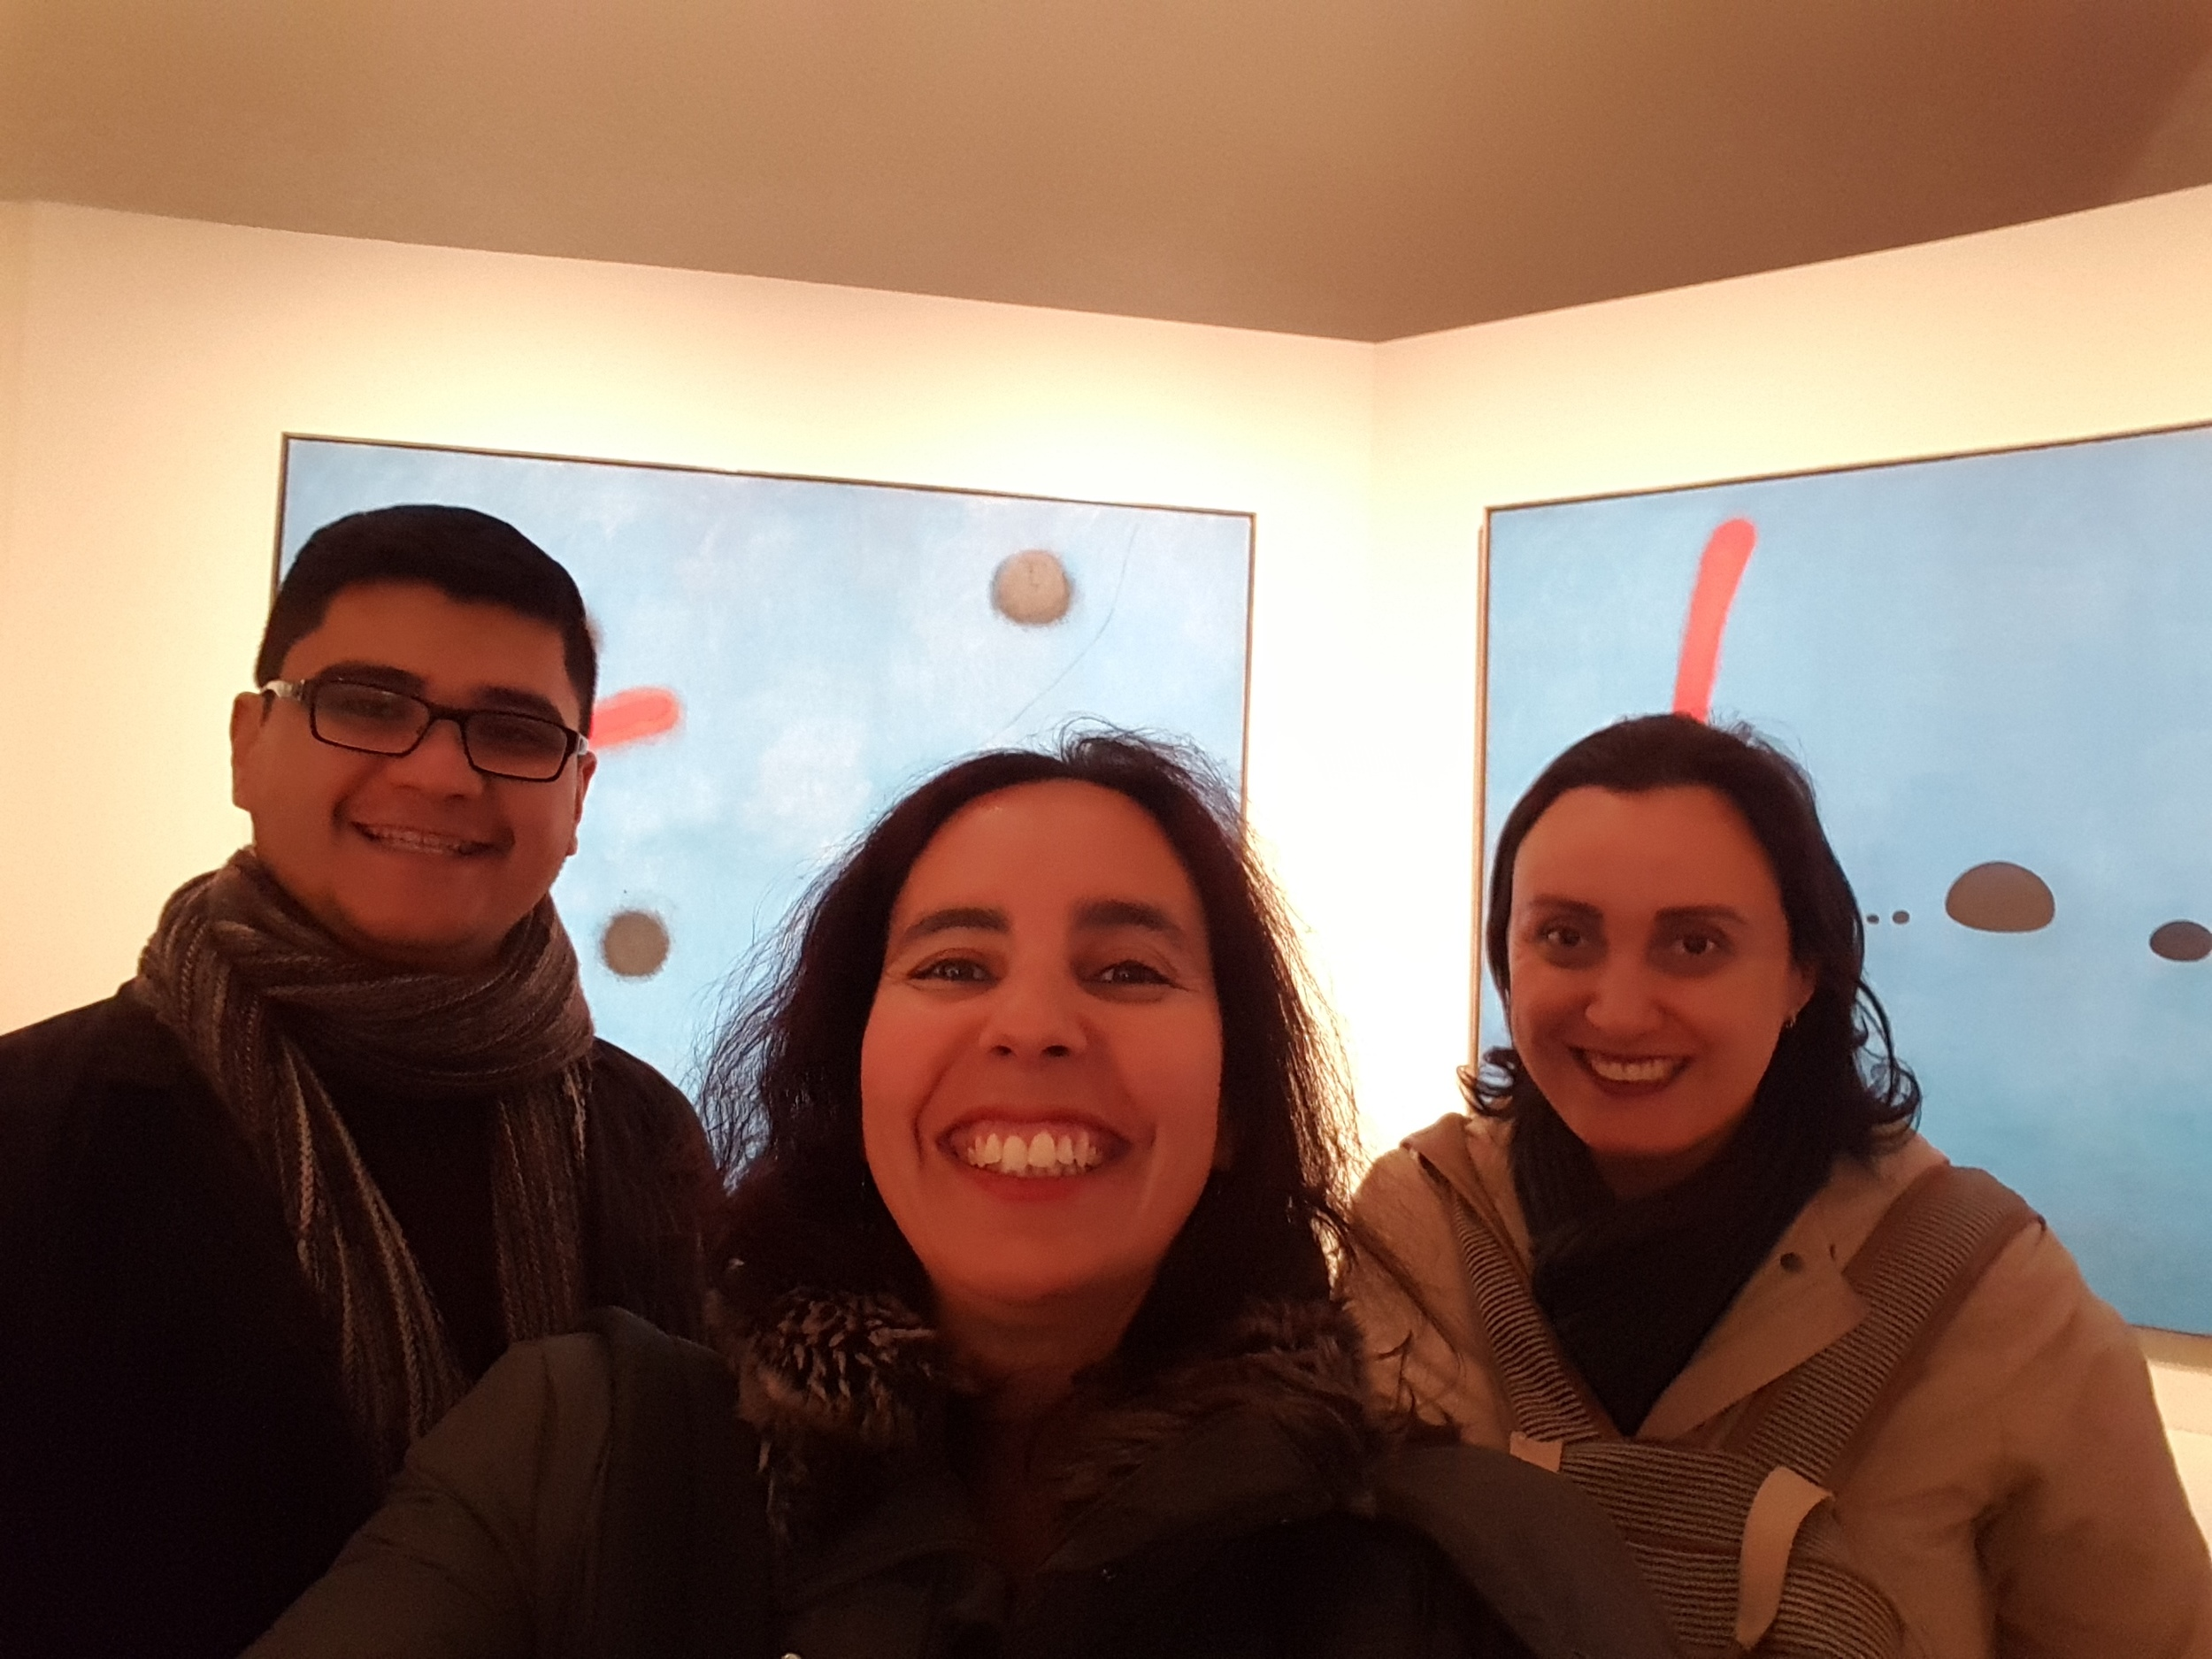 Frankfurt, Miro, Modern Art, Night at the Museum, April Big Things, Expat Living